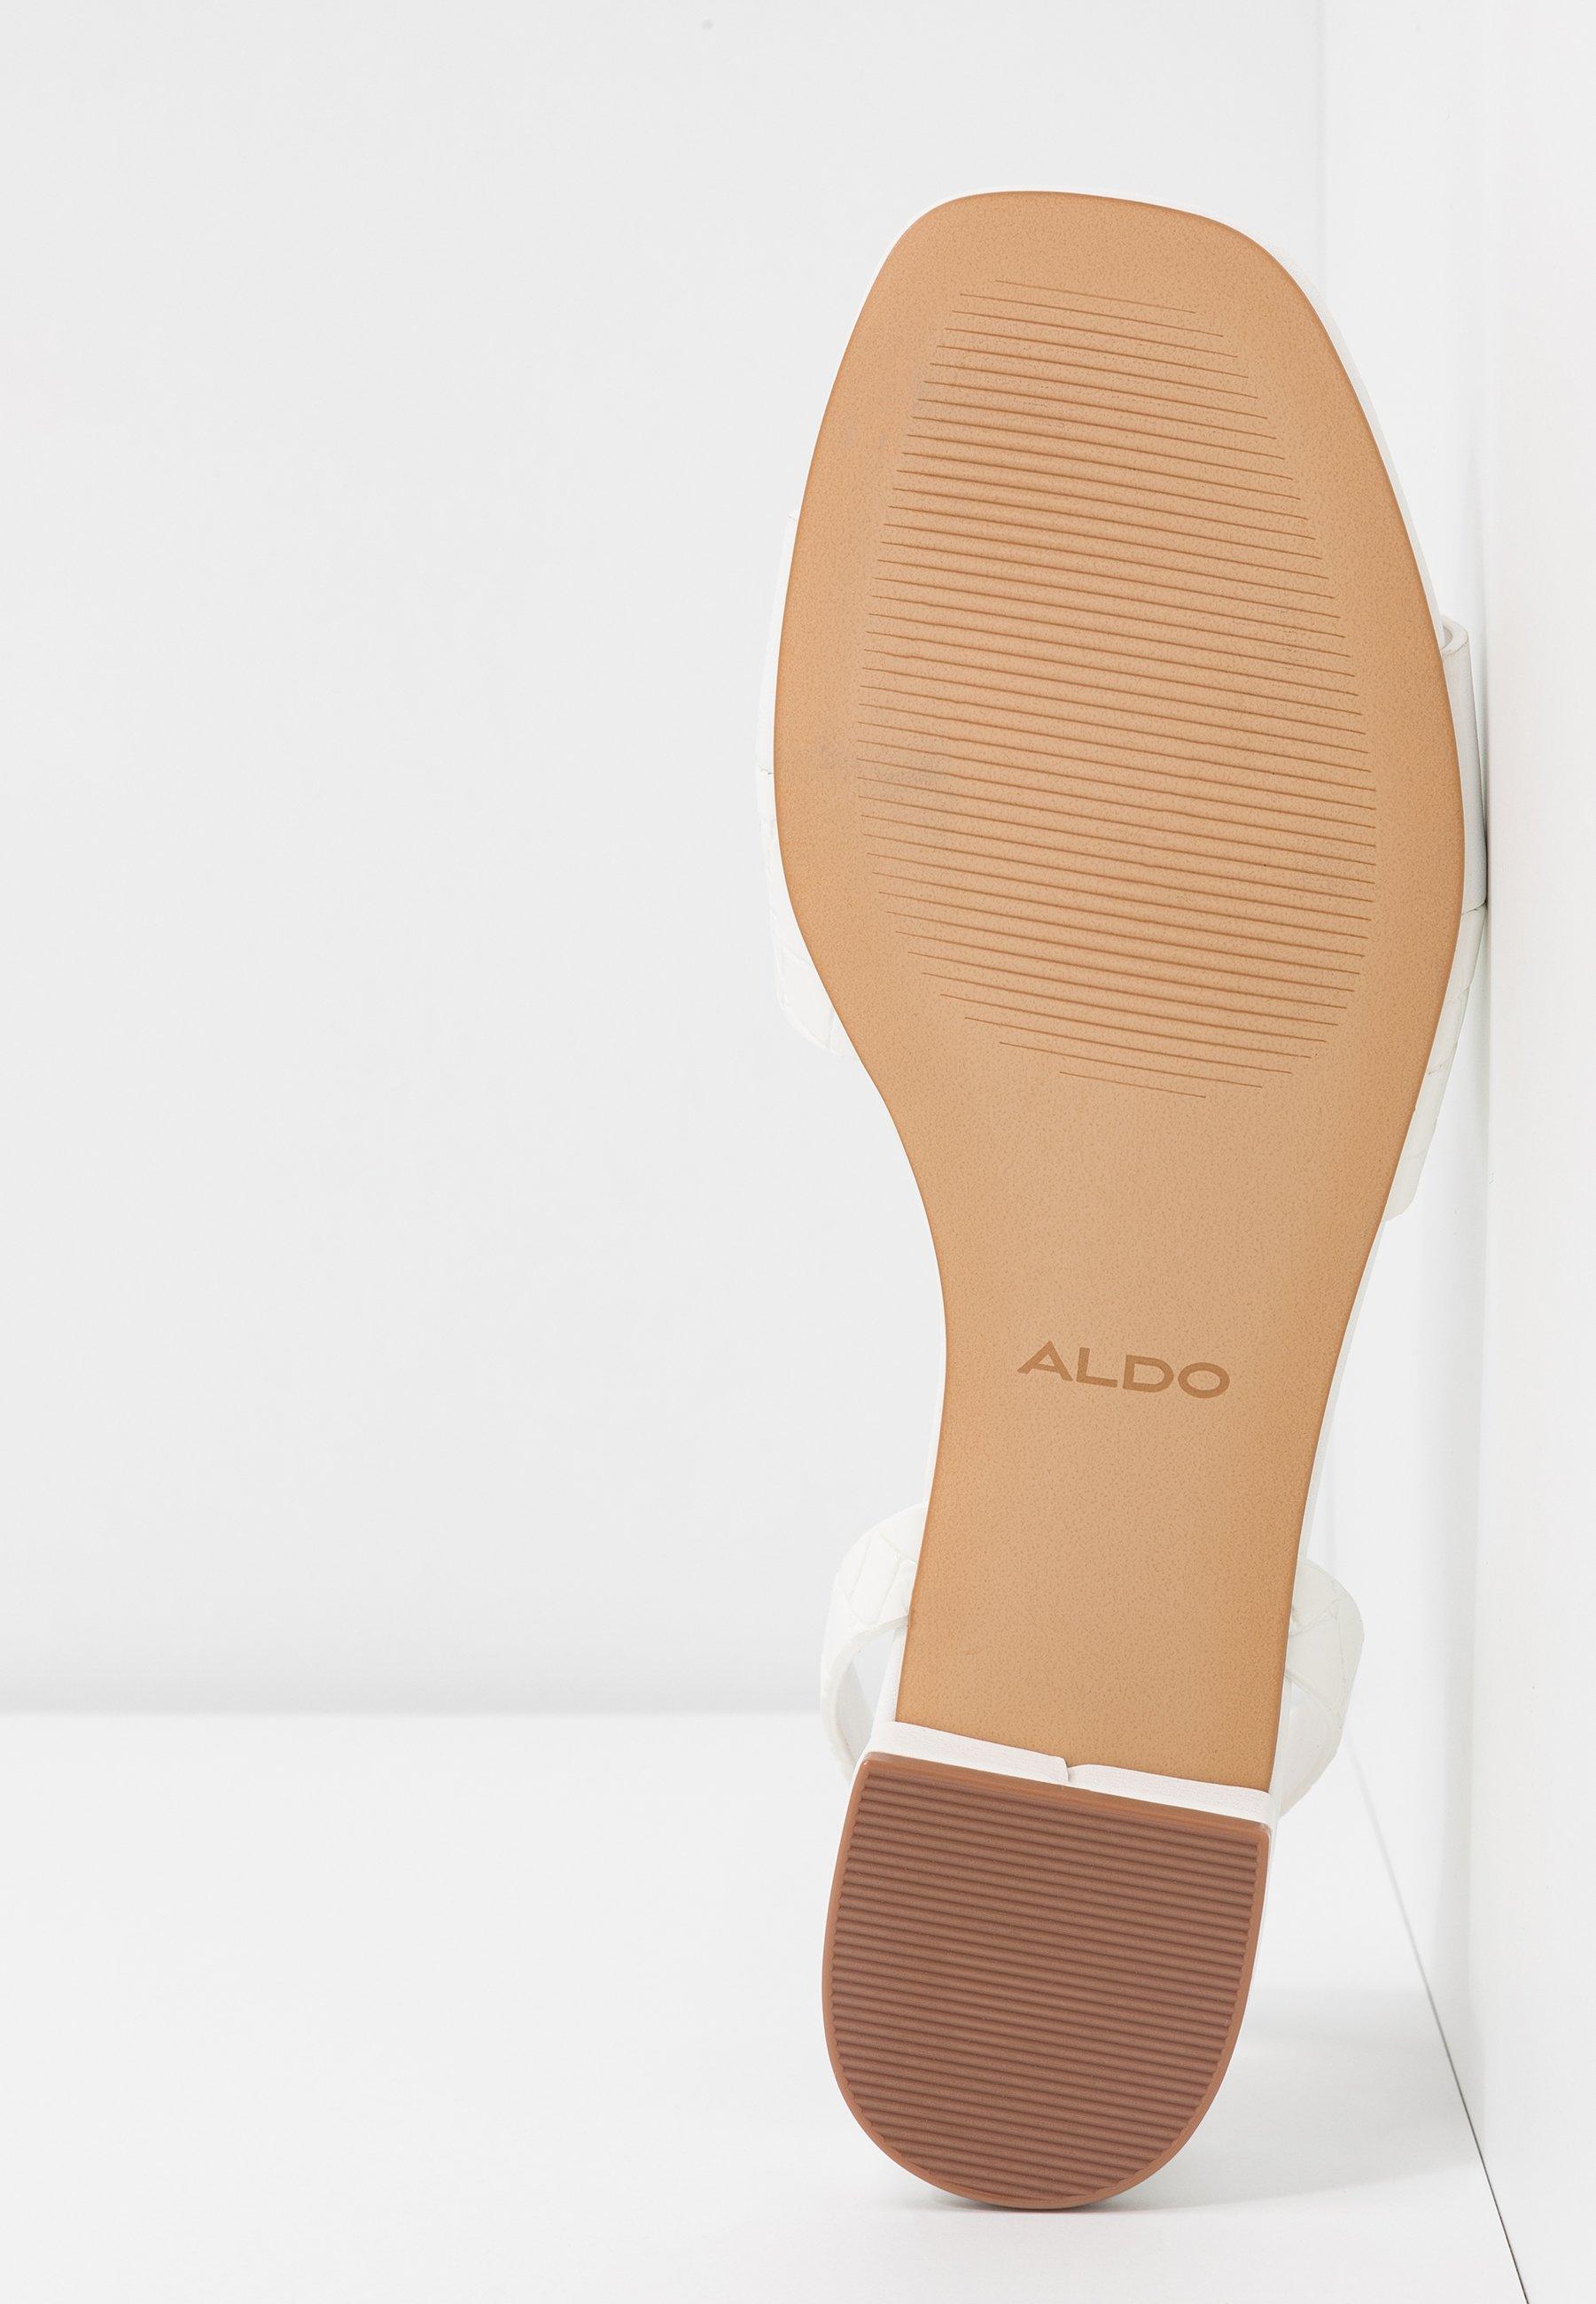 ALDO CANDY - Sandales - white